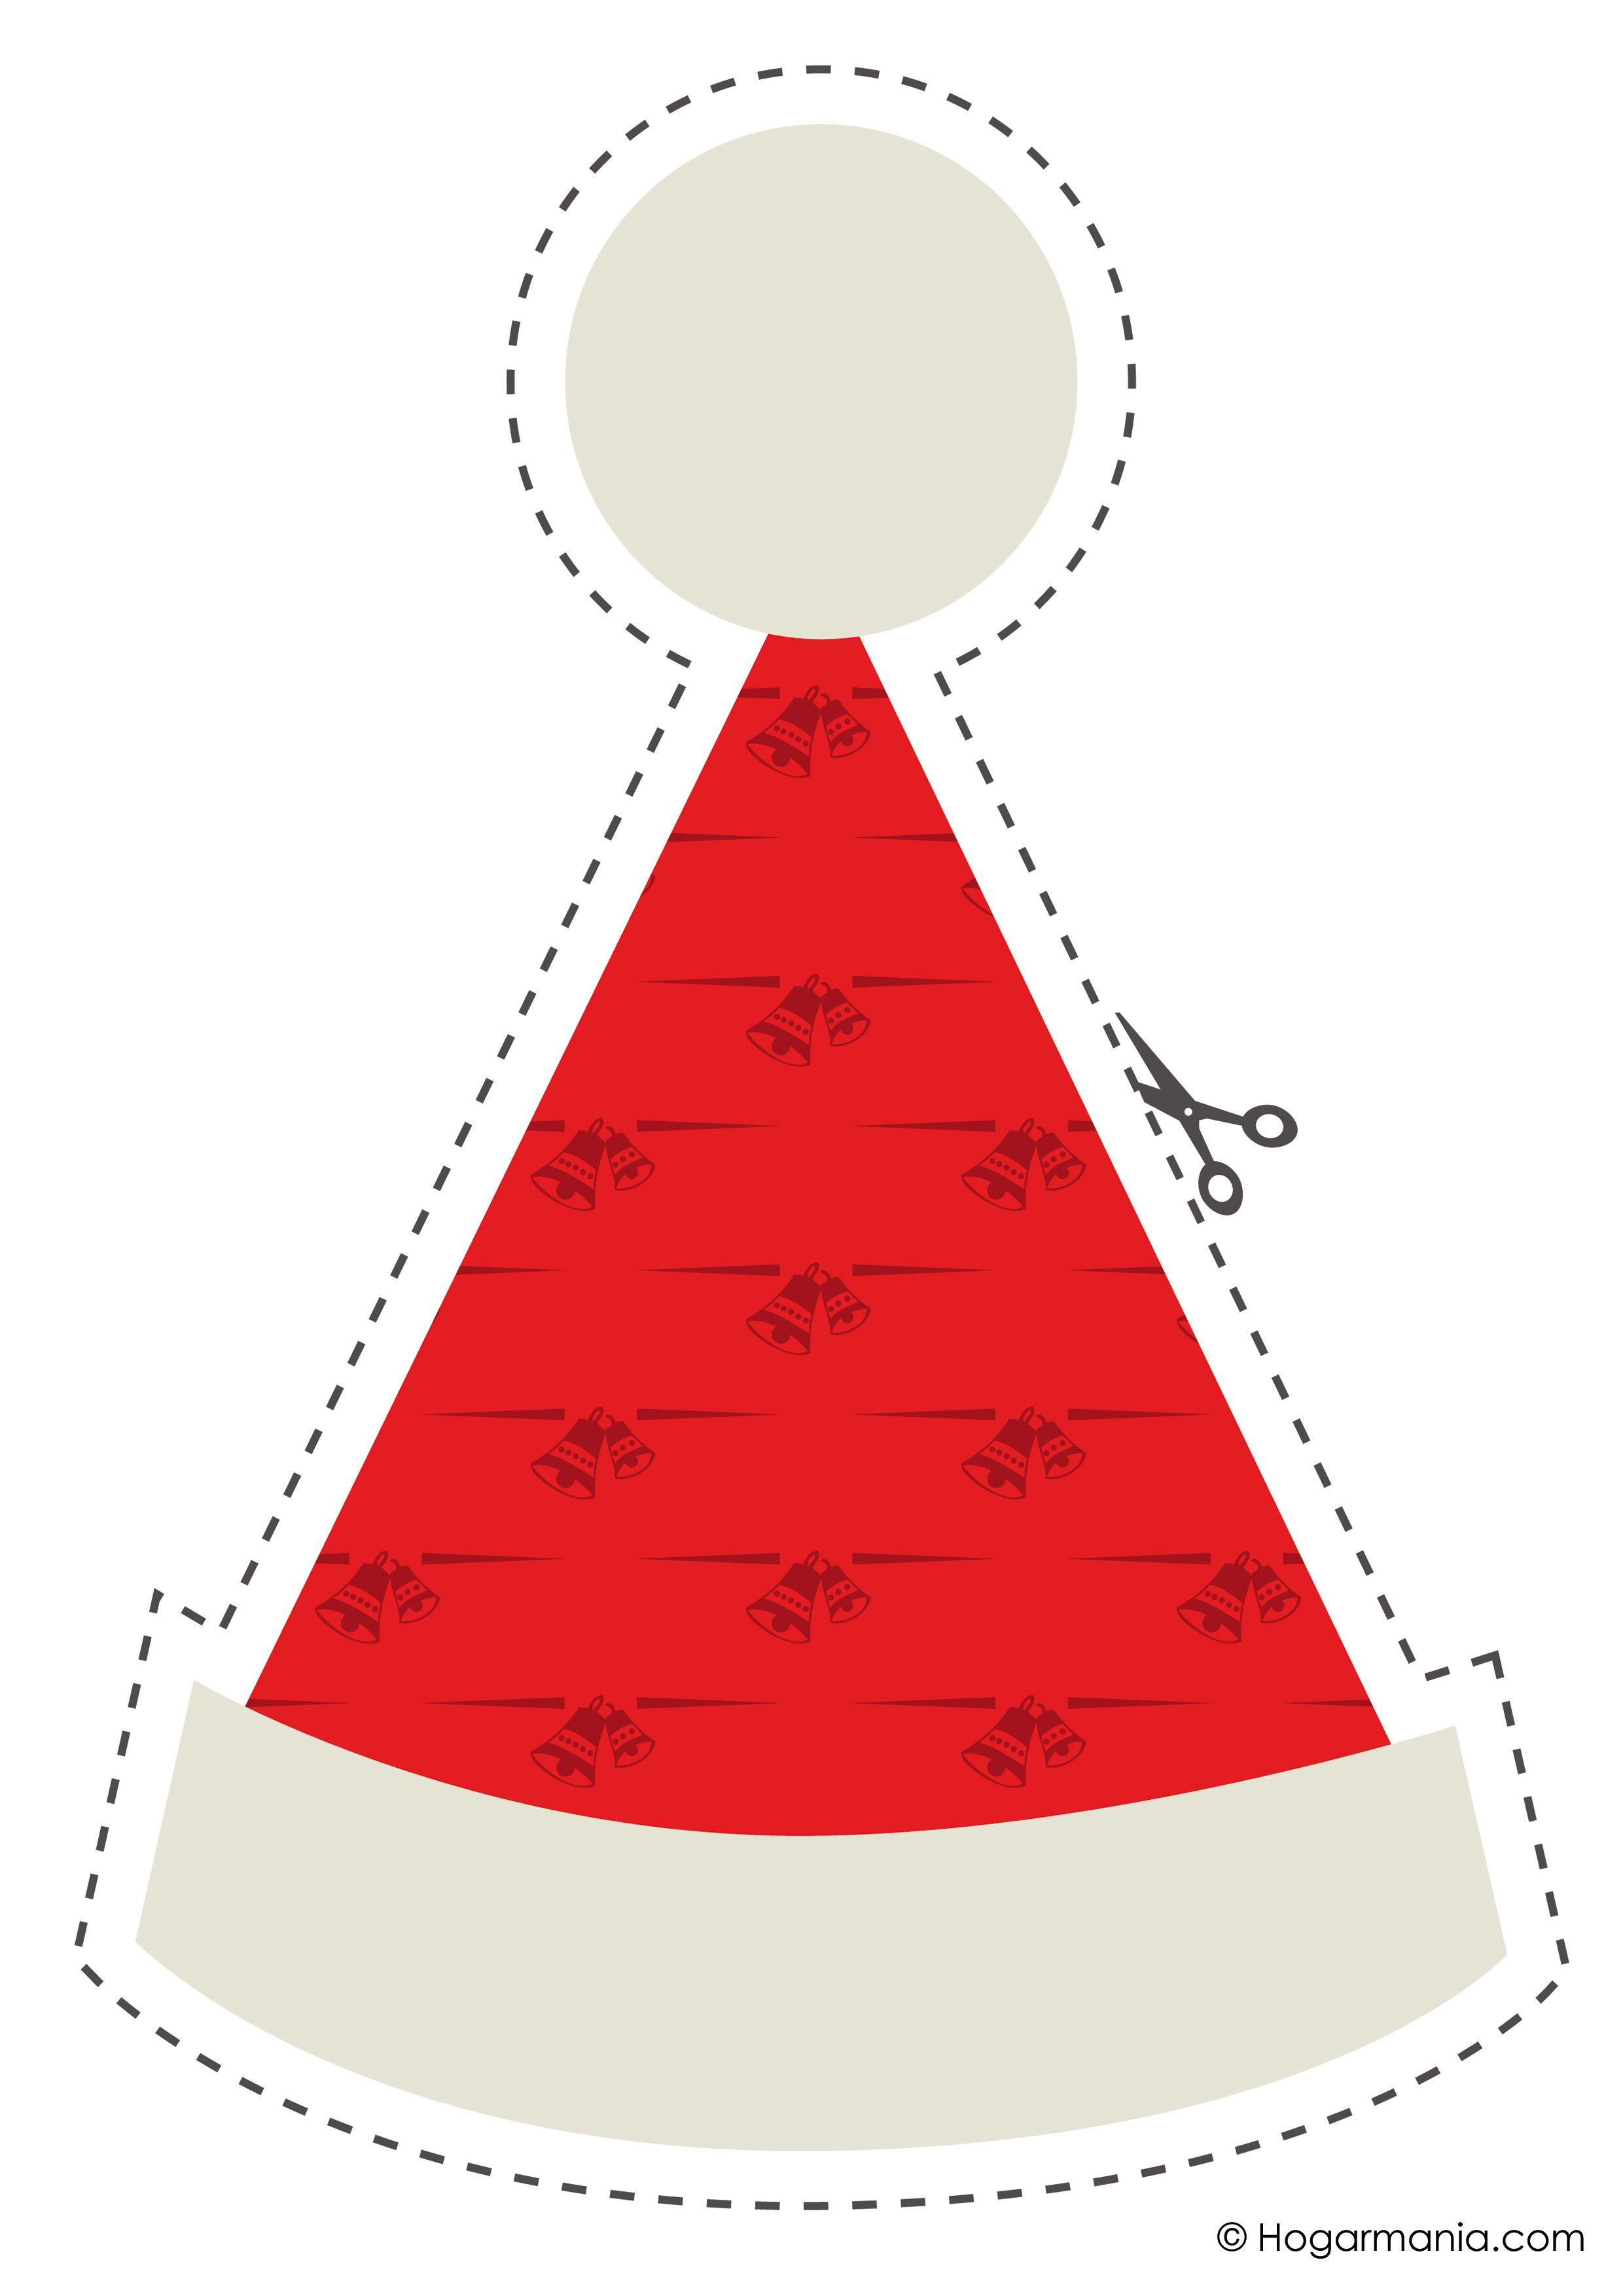 gorro-navidad-photocall-navidad.jpg (Imagen JPEG, 2480 × 3508 píxeles) - Escalado (18 %)